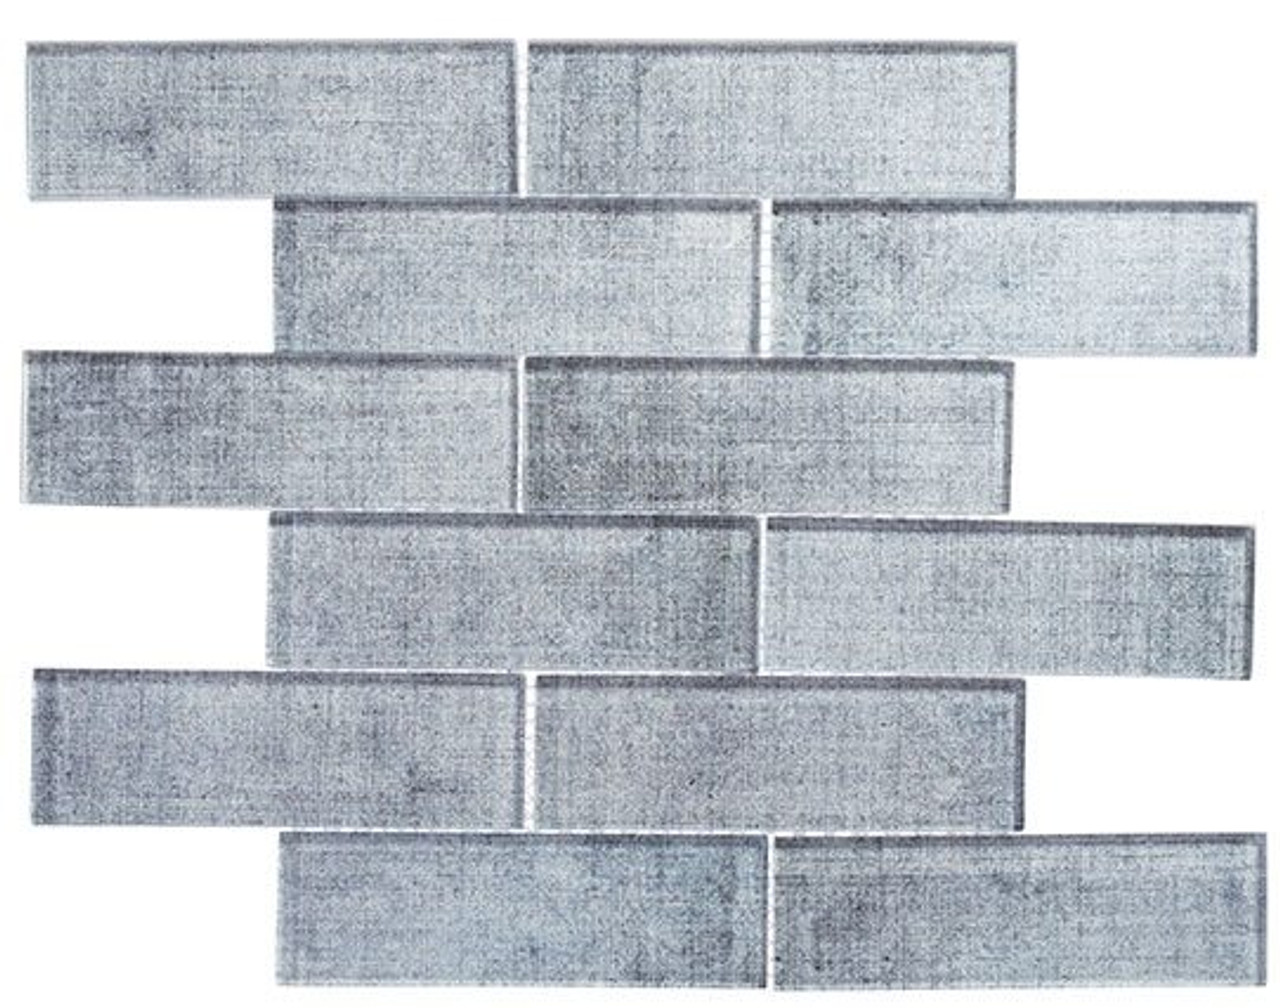 Bella Glass Tiles Westminster Series WM775 London Fog